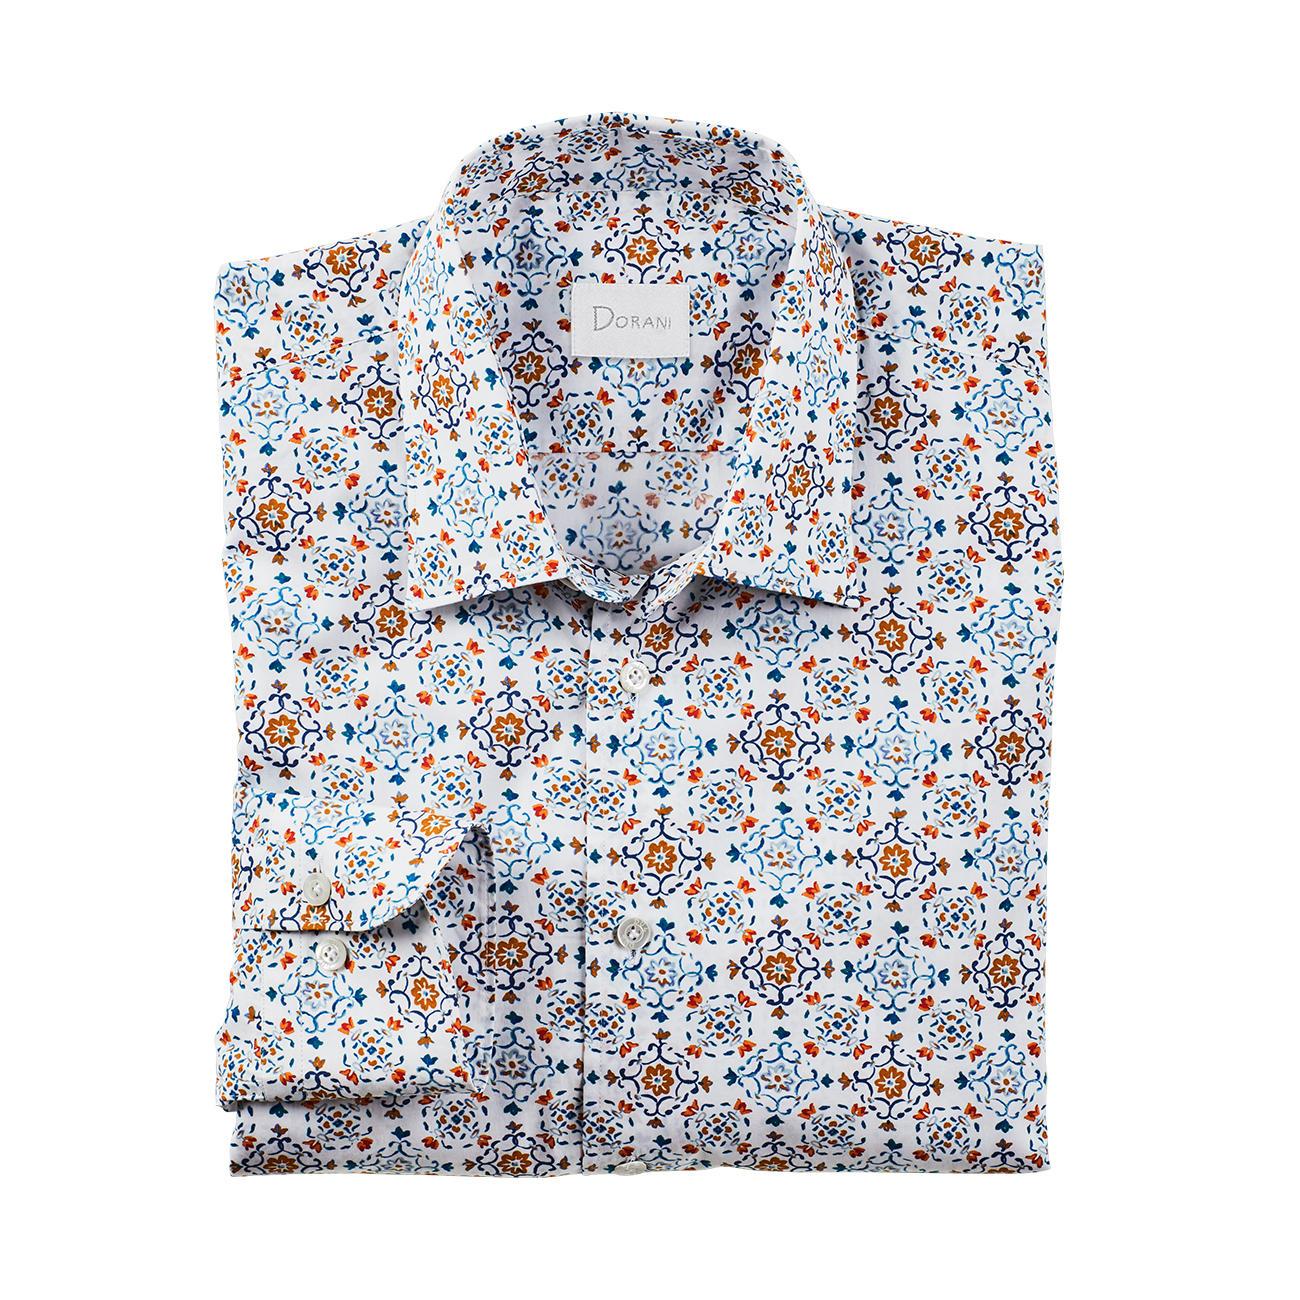 NEU Damen Jeanshemd Klassische angepasst Hemden Größe 8 10 12 14 blaue Jeans